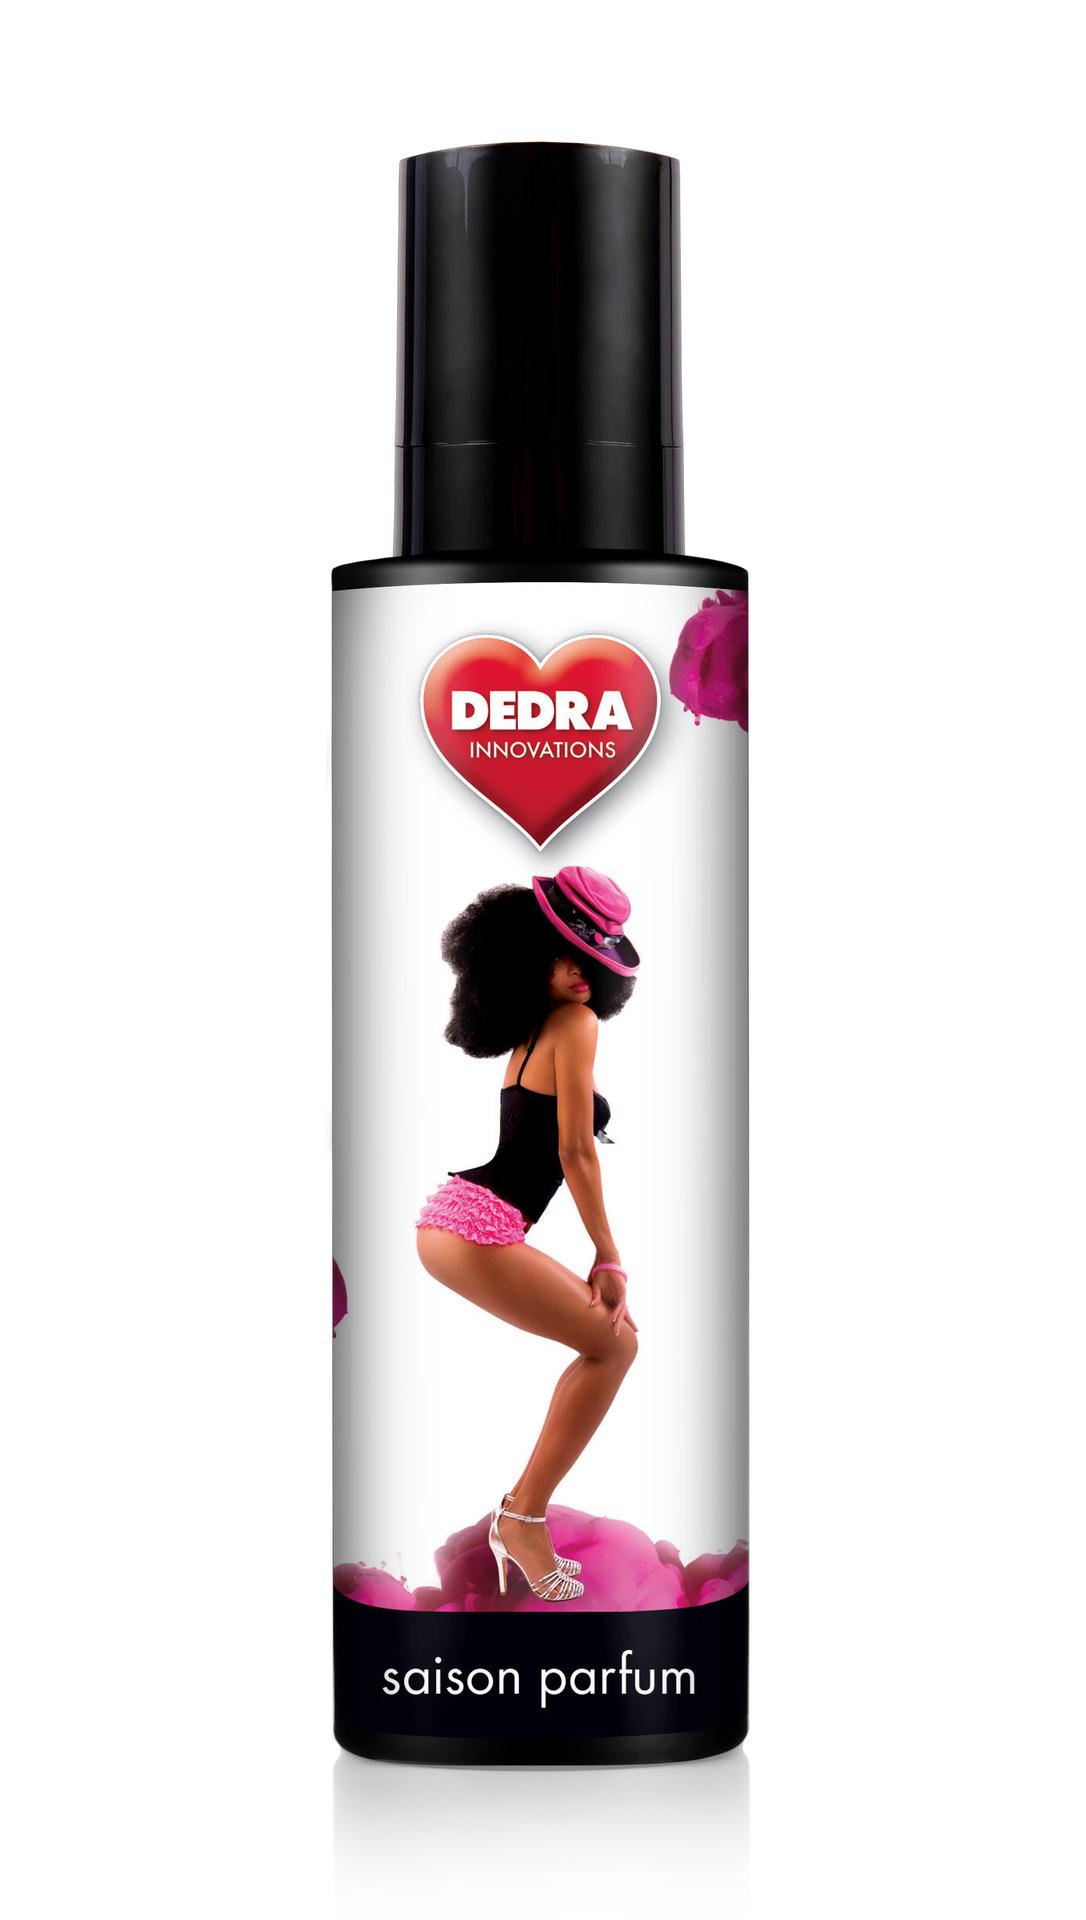 https://dedra.blob.core.windows.net/cms/ContentItems/2155_parfum-airatextiles-saison-parfum-osvezovac-vzduchu-a-textilii/images/hp0367-07-2018-cerny.jpg